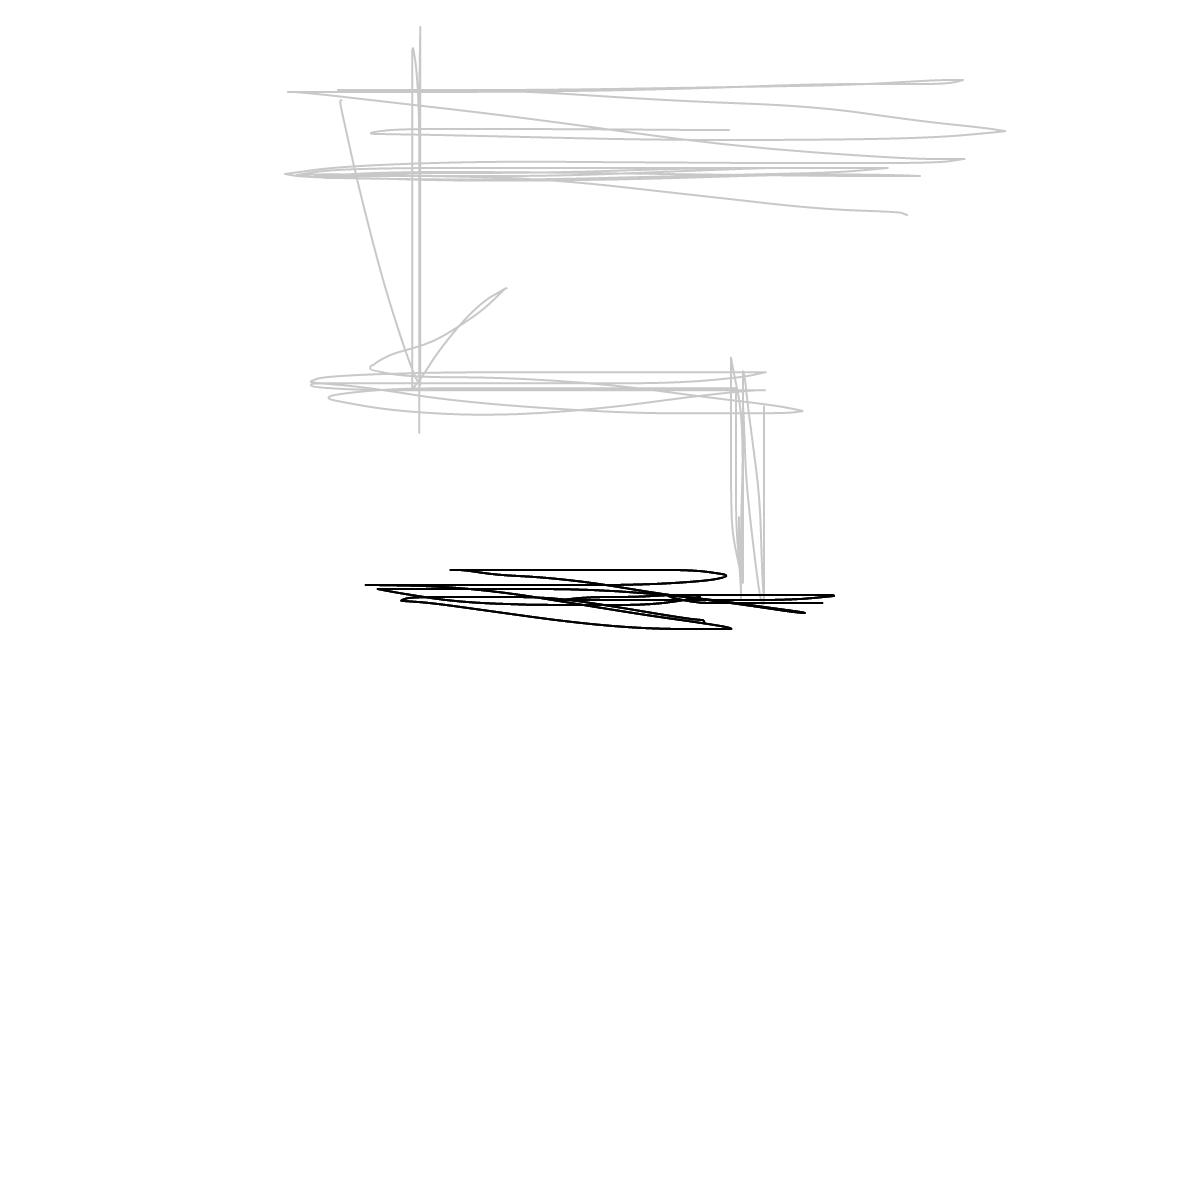 BAAAM drawing#23433 lat:77.0888671875000000lng: 156.5493774414062500